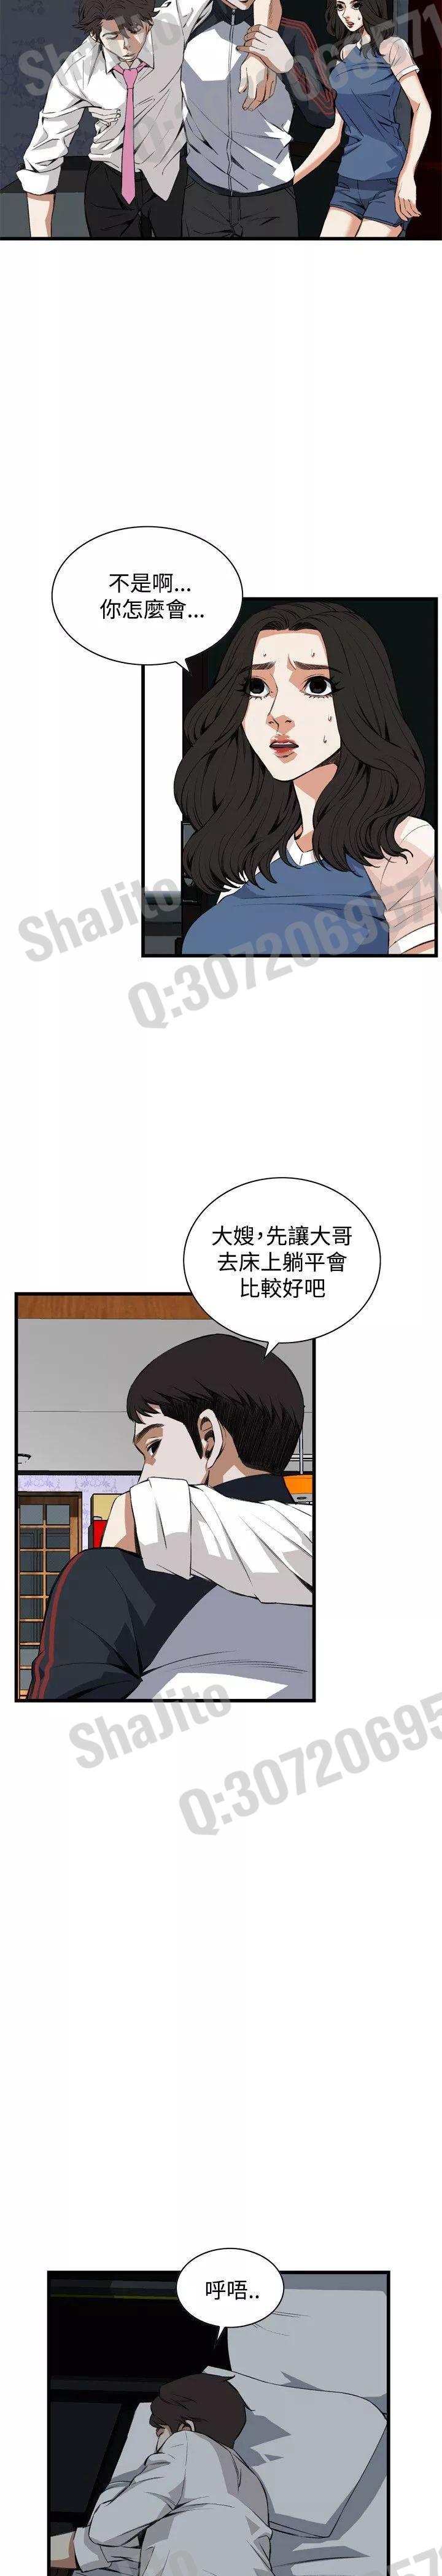 Take a peek 偷窥67-69 Chinese 56